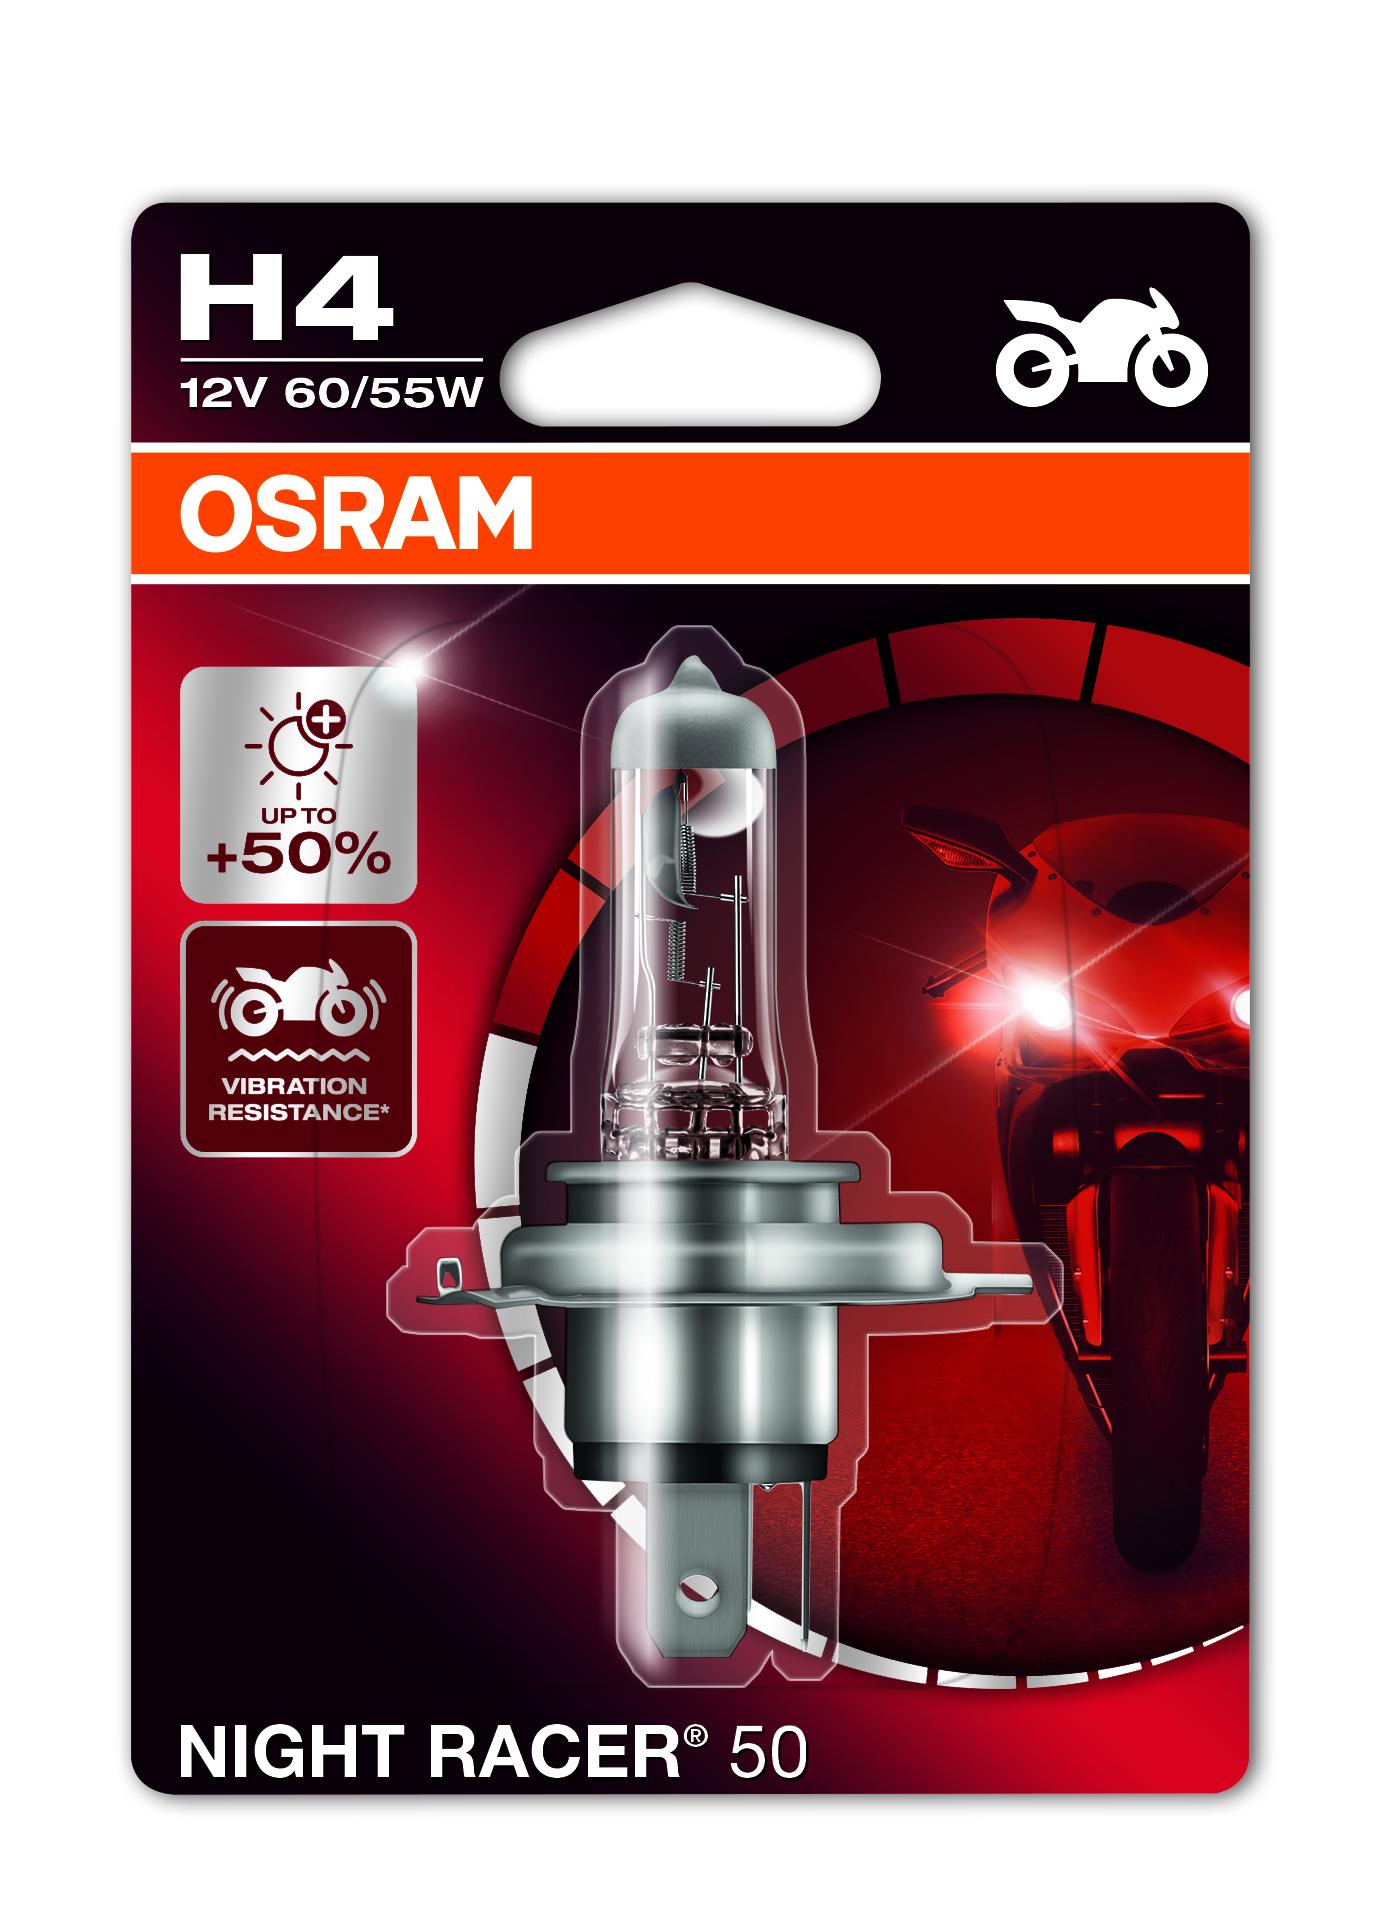 Osram halogenová žárovka, MOTO Night Racer 50, H4, P43t, 12V, 60/55W, 64193NR5-01B